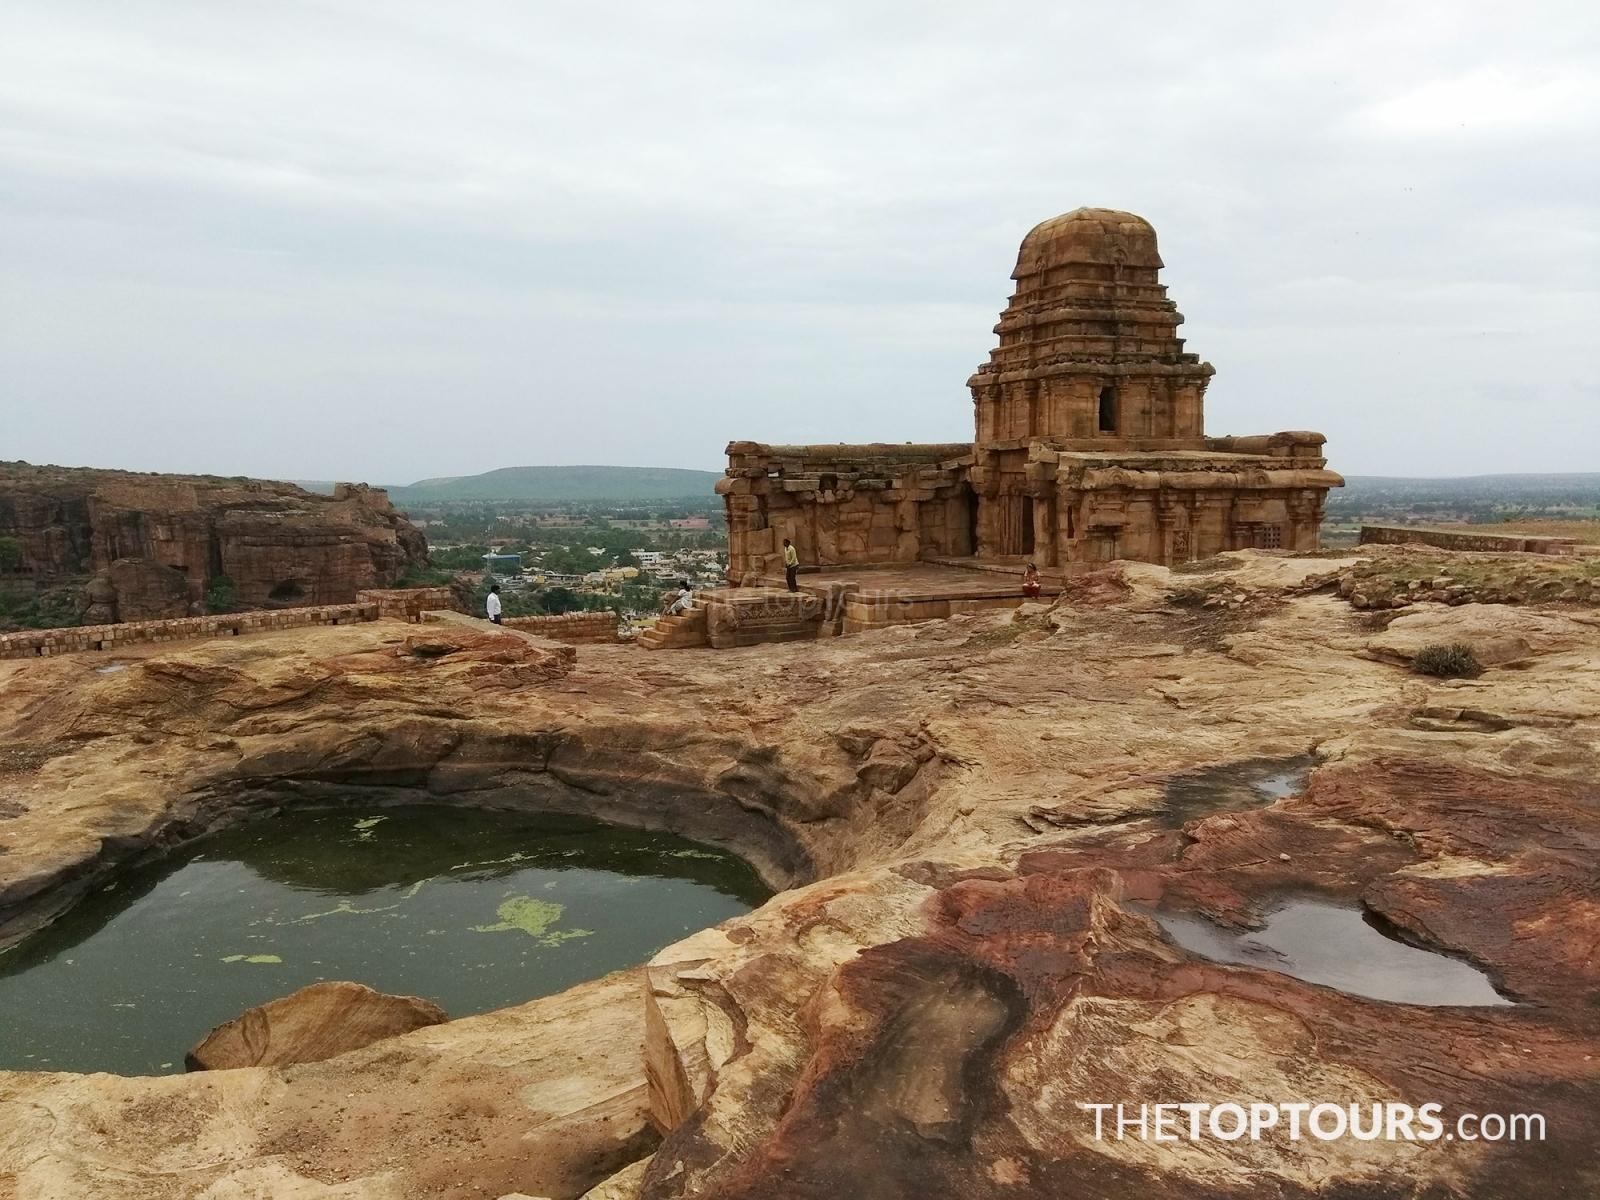 The Rock Cut Cave Temples of Badami, Karnataka